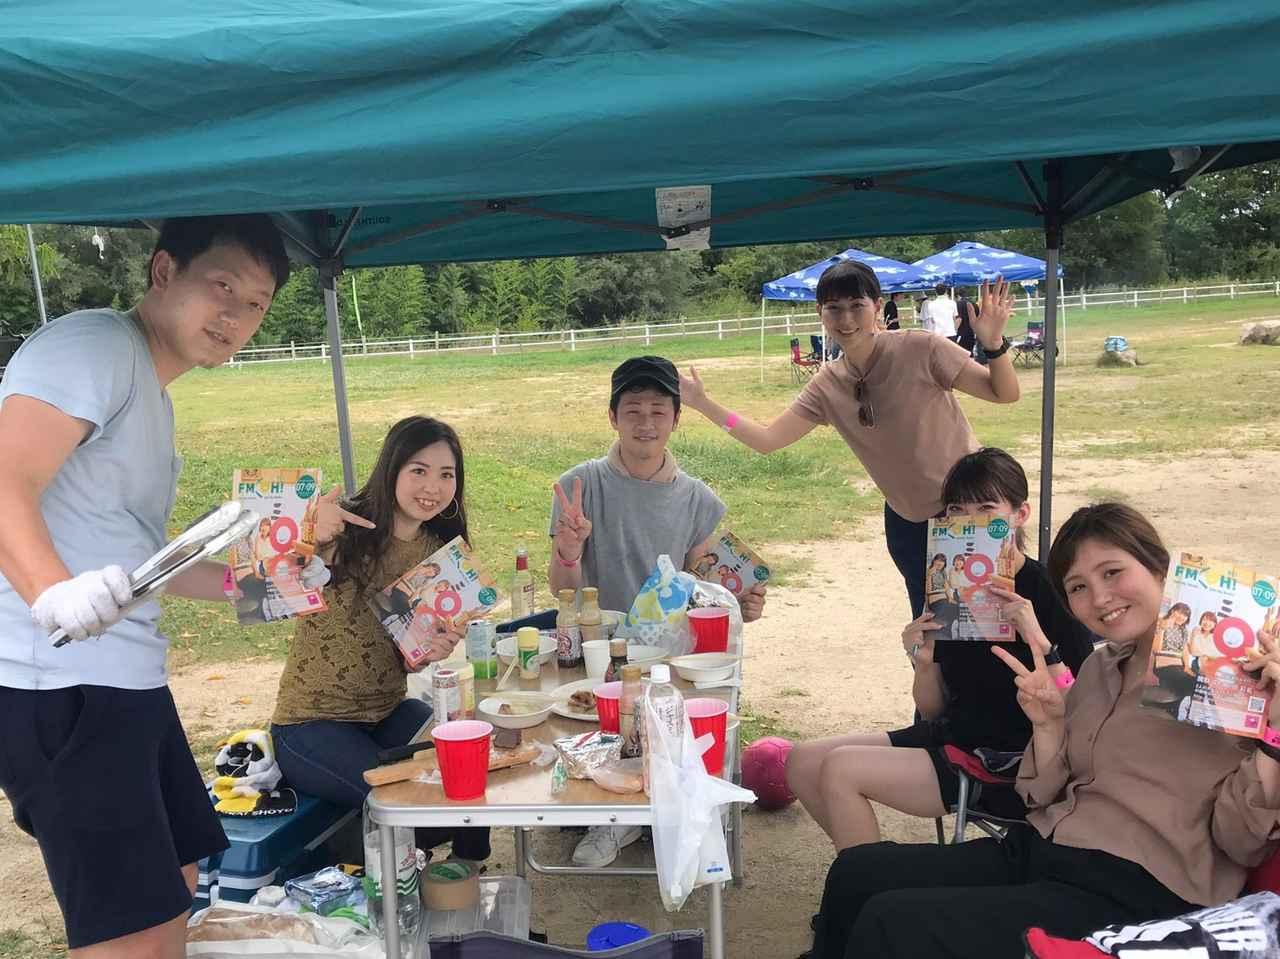 画像4: 8月16日:「大阪王 presents 彩名が行く!餃子世界化計画」